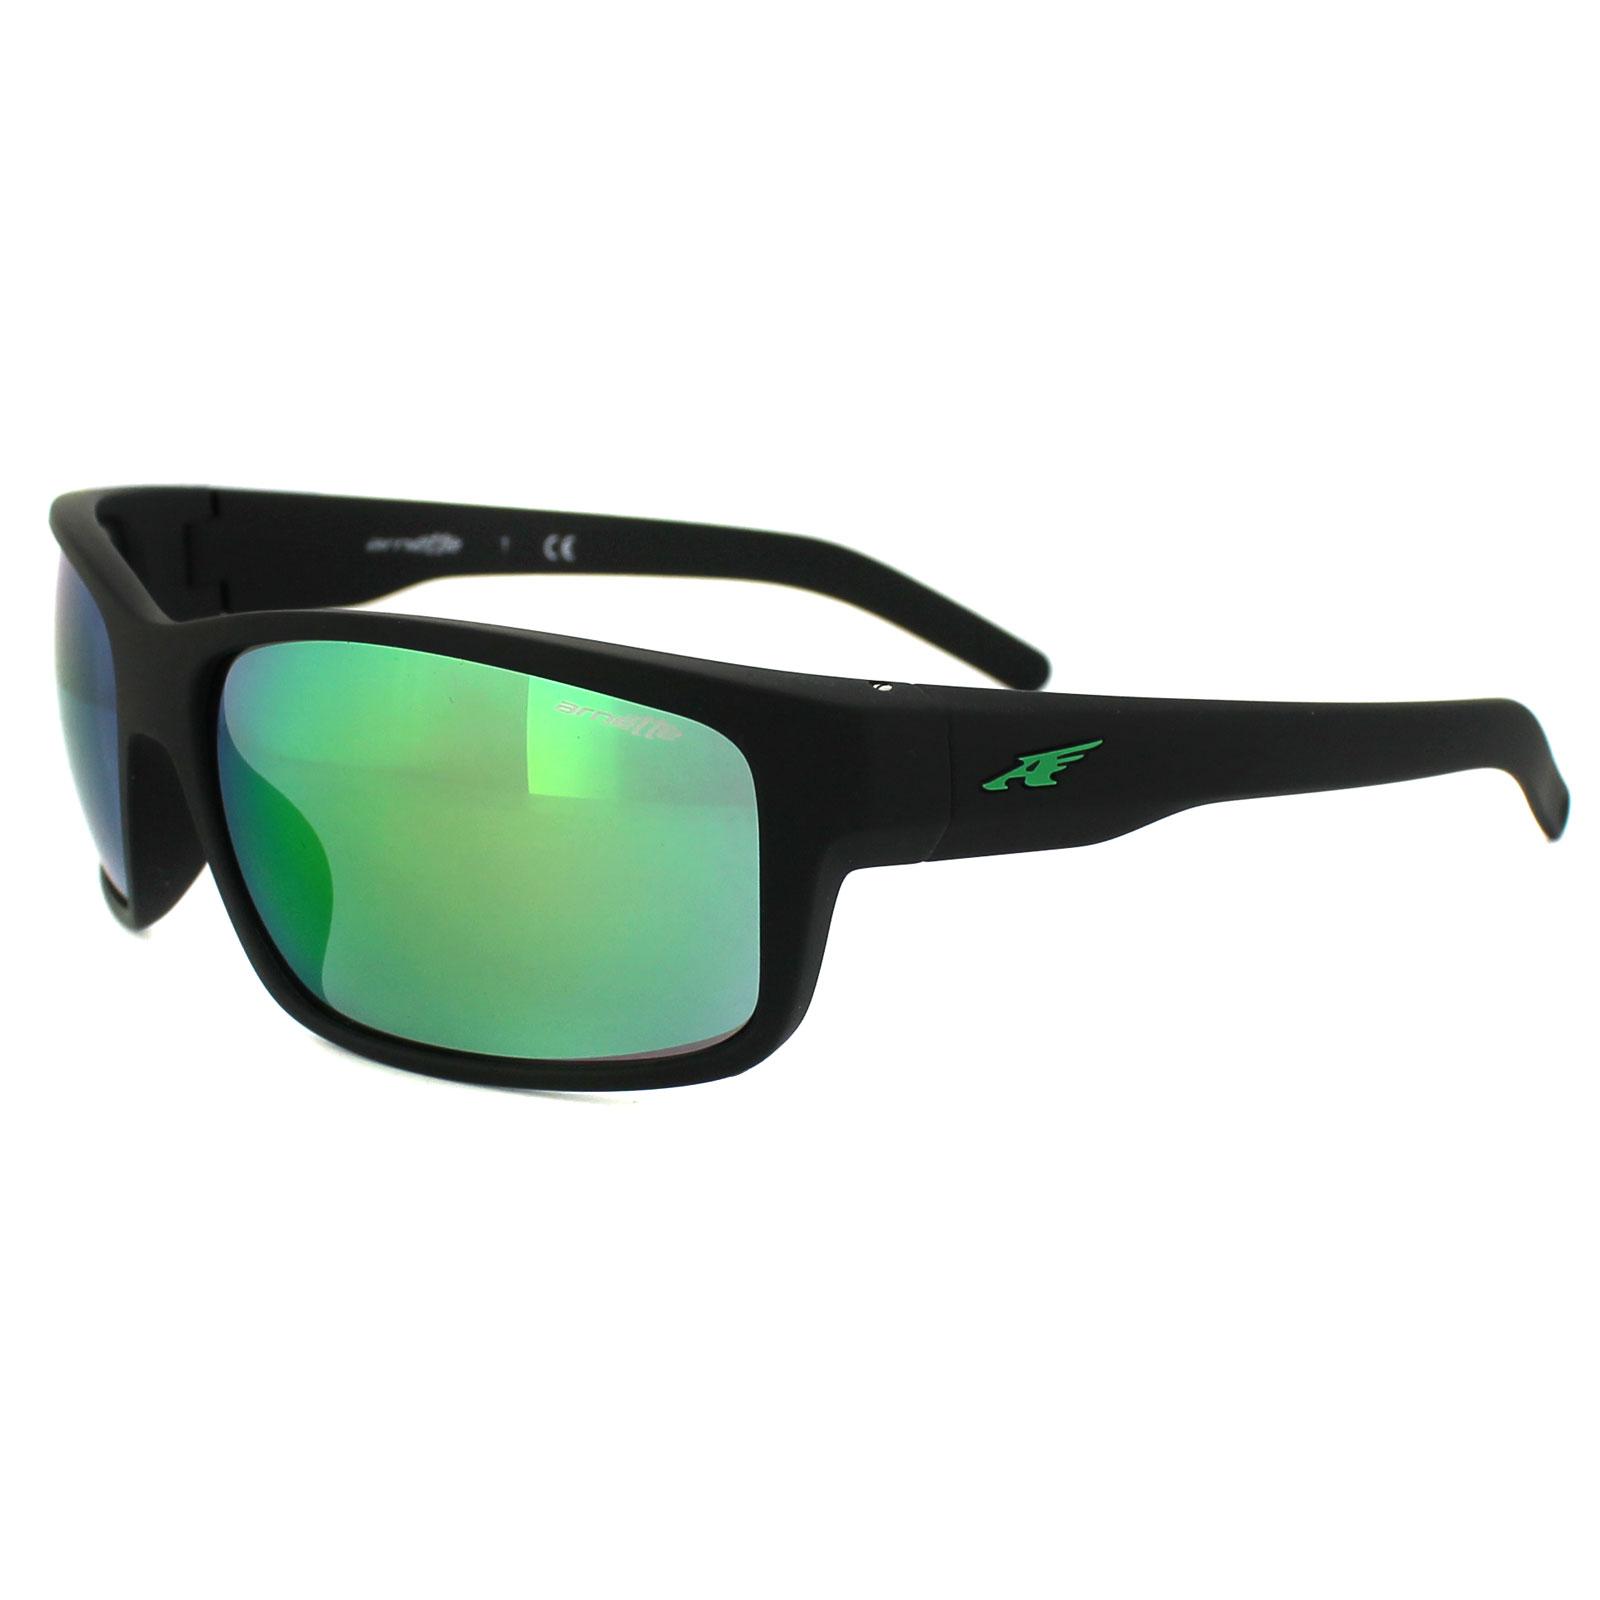 6476123058c Cheap Arnette Sunglasses 4202 Fastball - Discounted Sunglasses